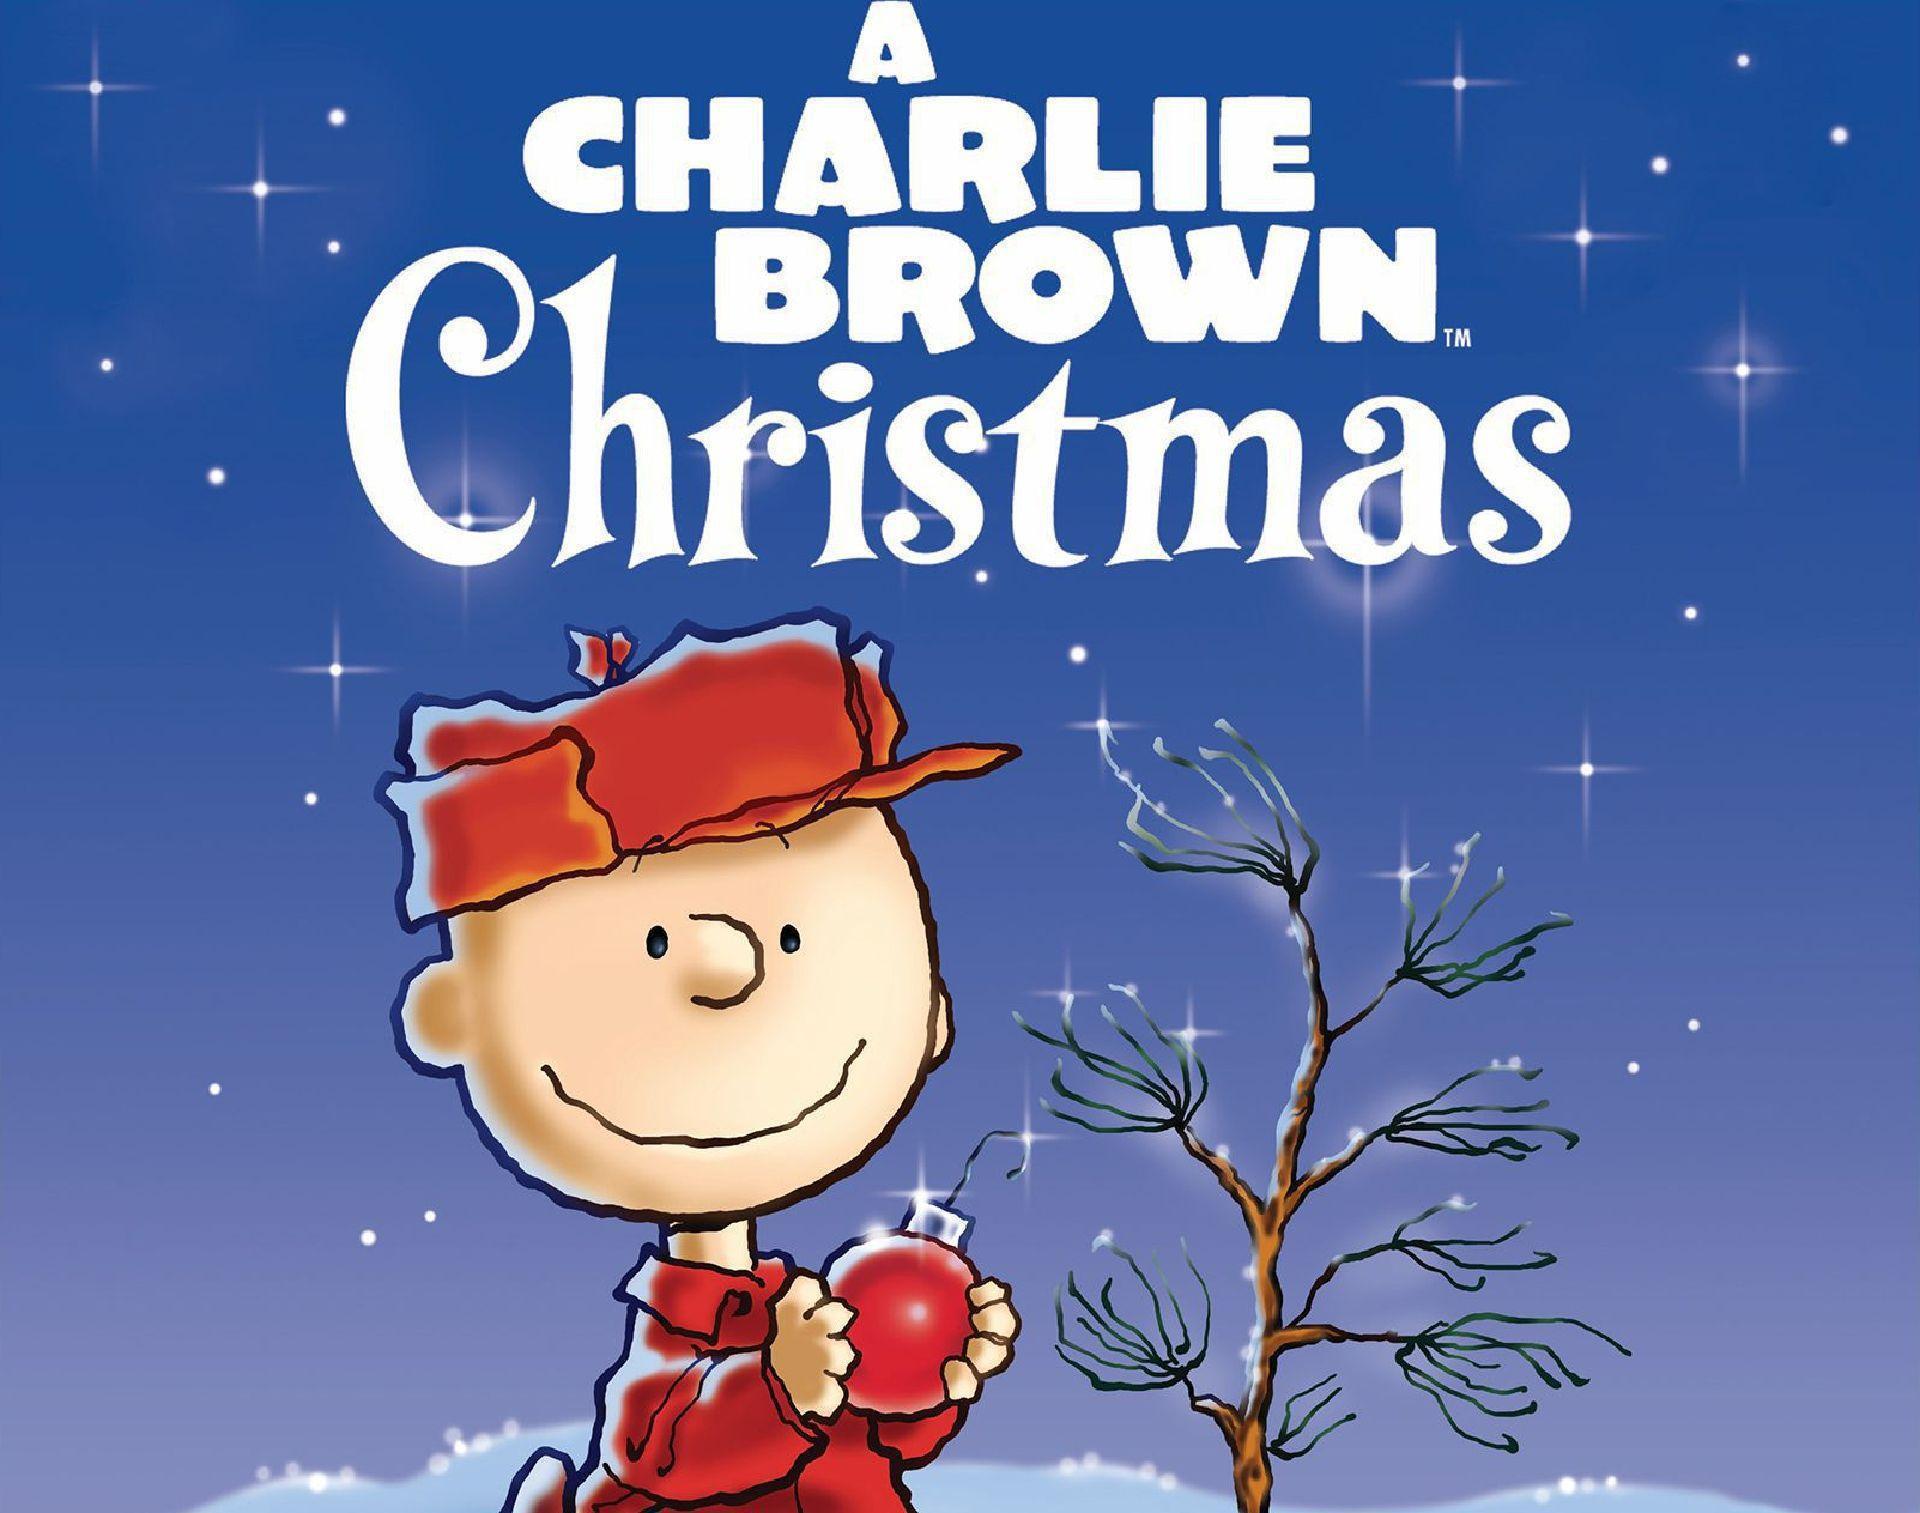 Charlie Brown Christmas Wallpapers